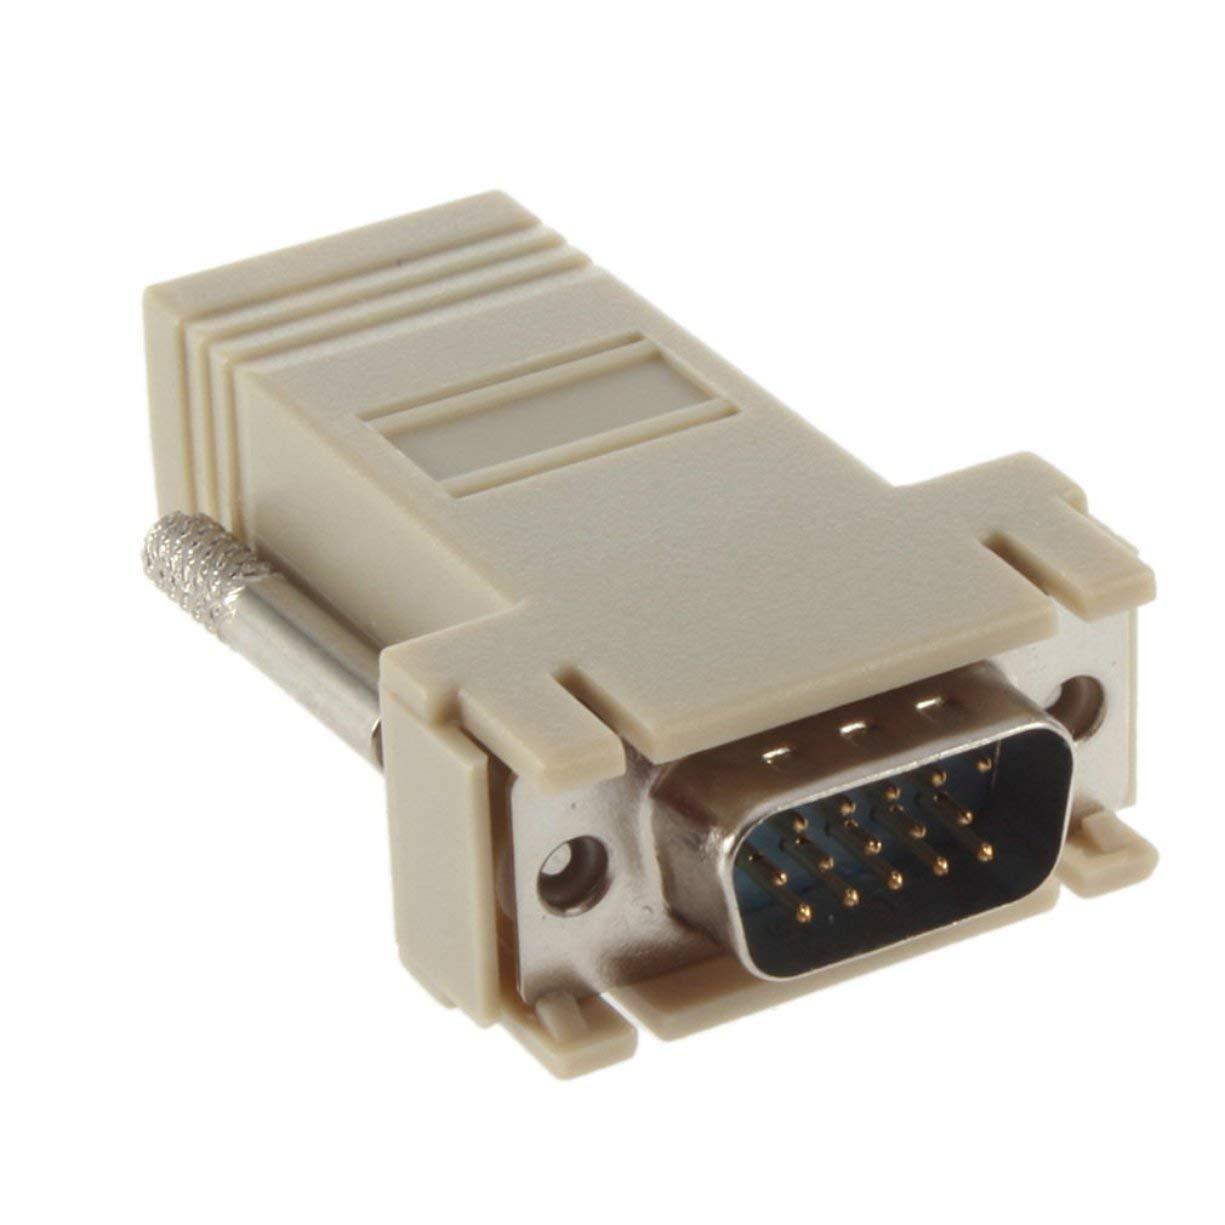 VGA Extender Male to LAN CAT5 CAT5e CAT6 RJ45 Network Cable Female Male Head Adapter, VGA Extender Male to LAN CAT5 CAT5e CAT6 RJ45 Network Cable Female Adapter Network Cable Extender Adapter